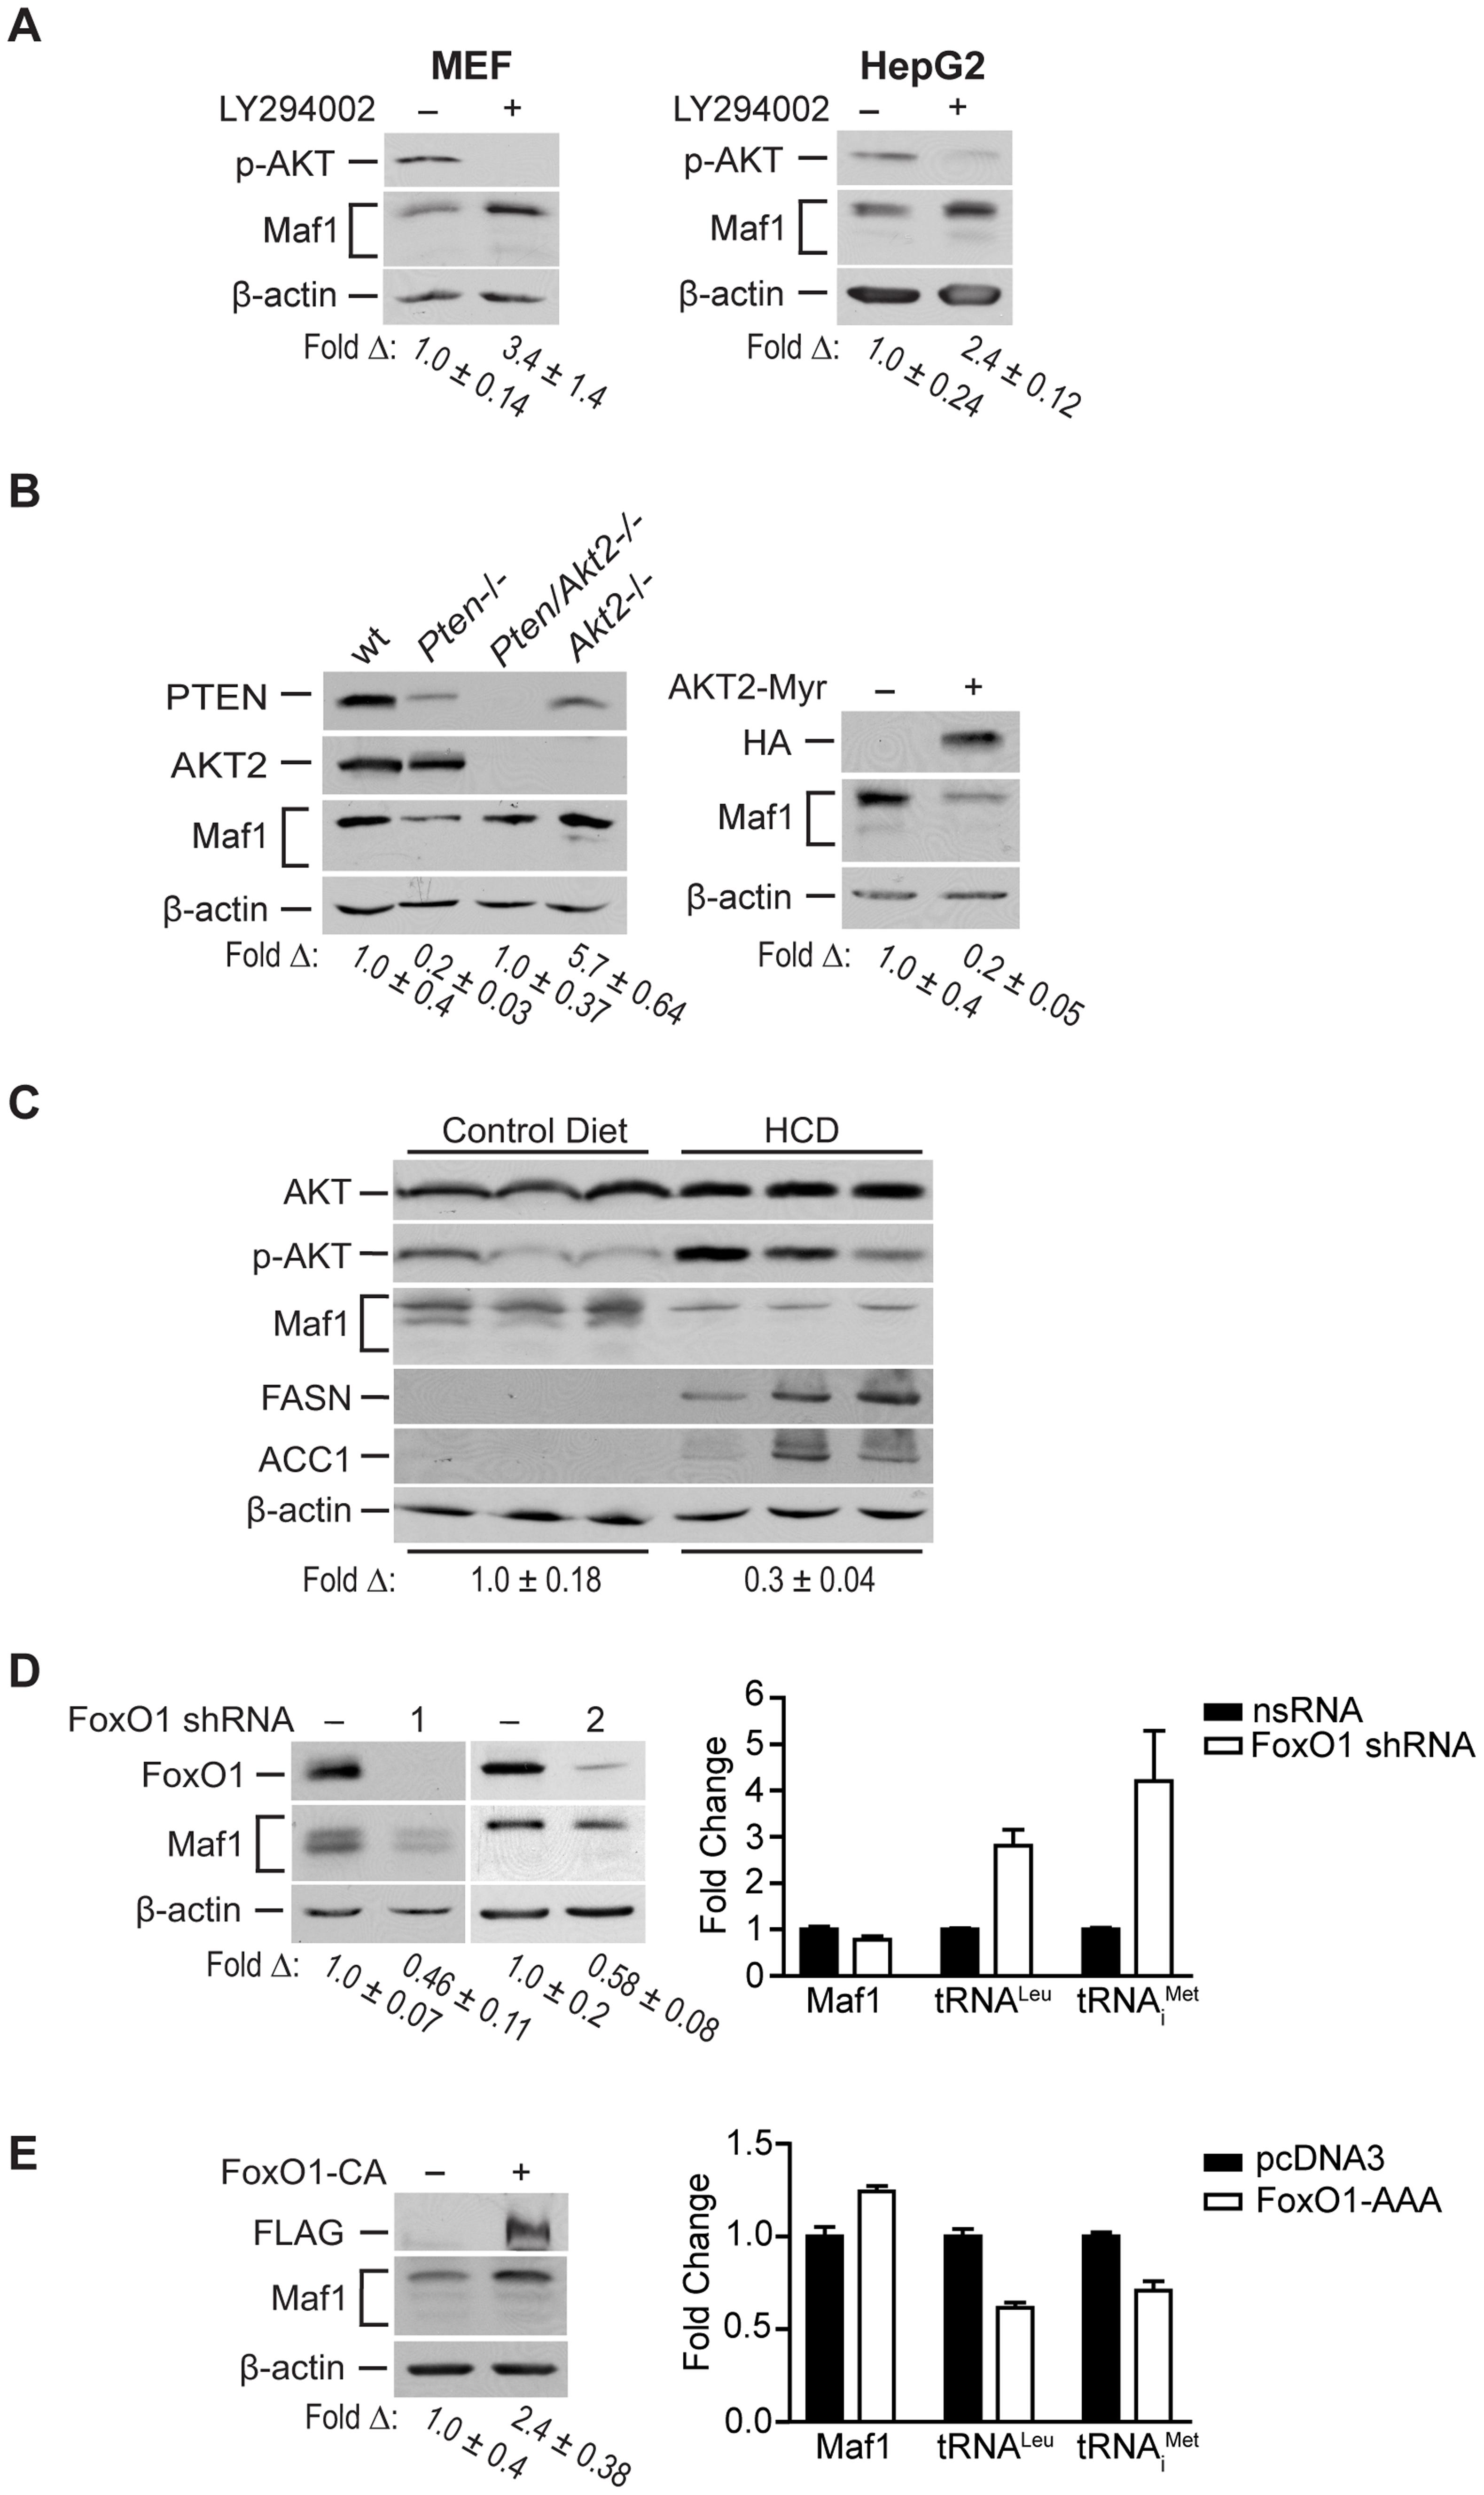 Maf1 is regulated through PI3K/AKT/FOXO1 signaling.